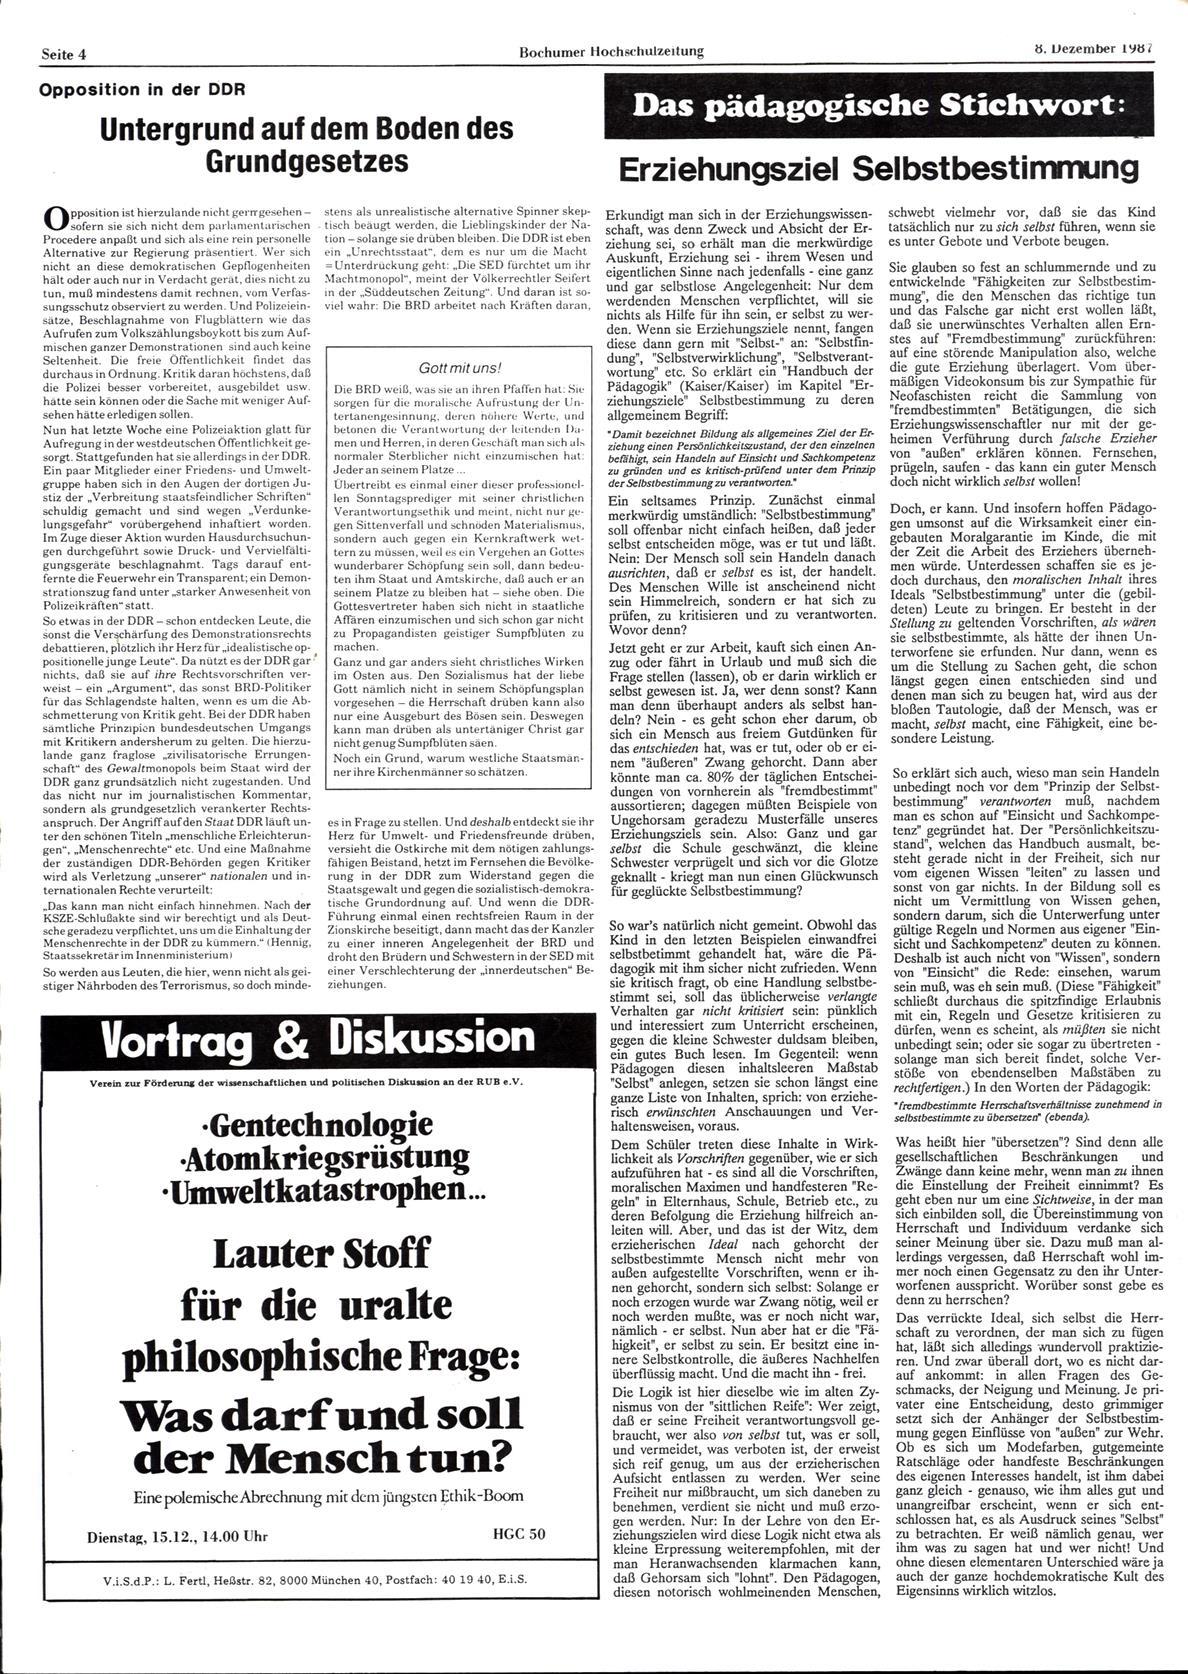 Bochum_BHZ_19871208_161_004